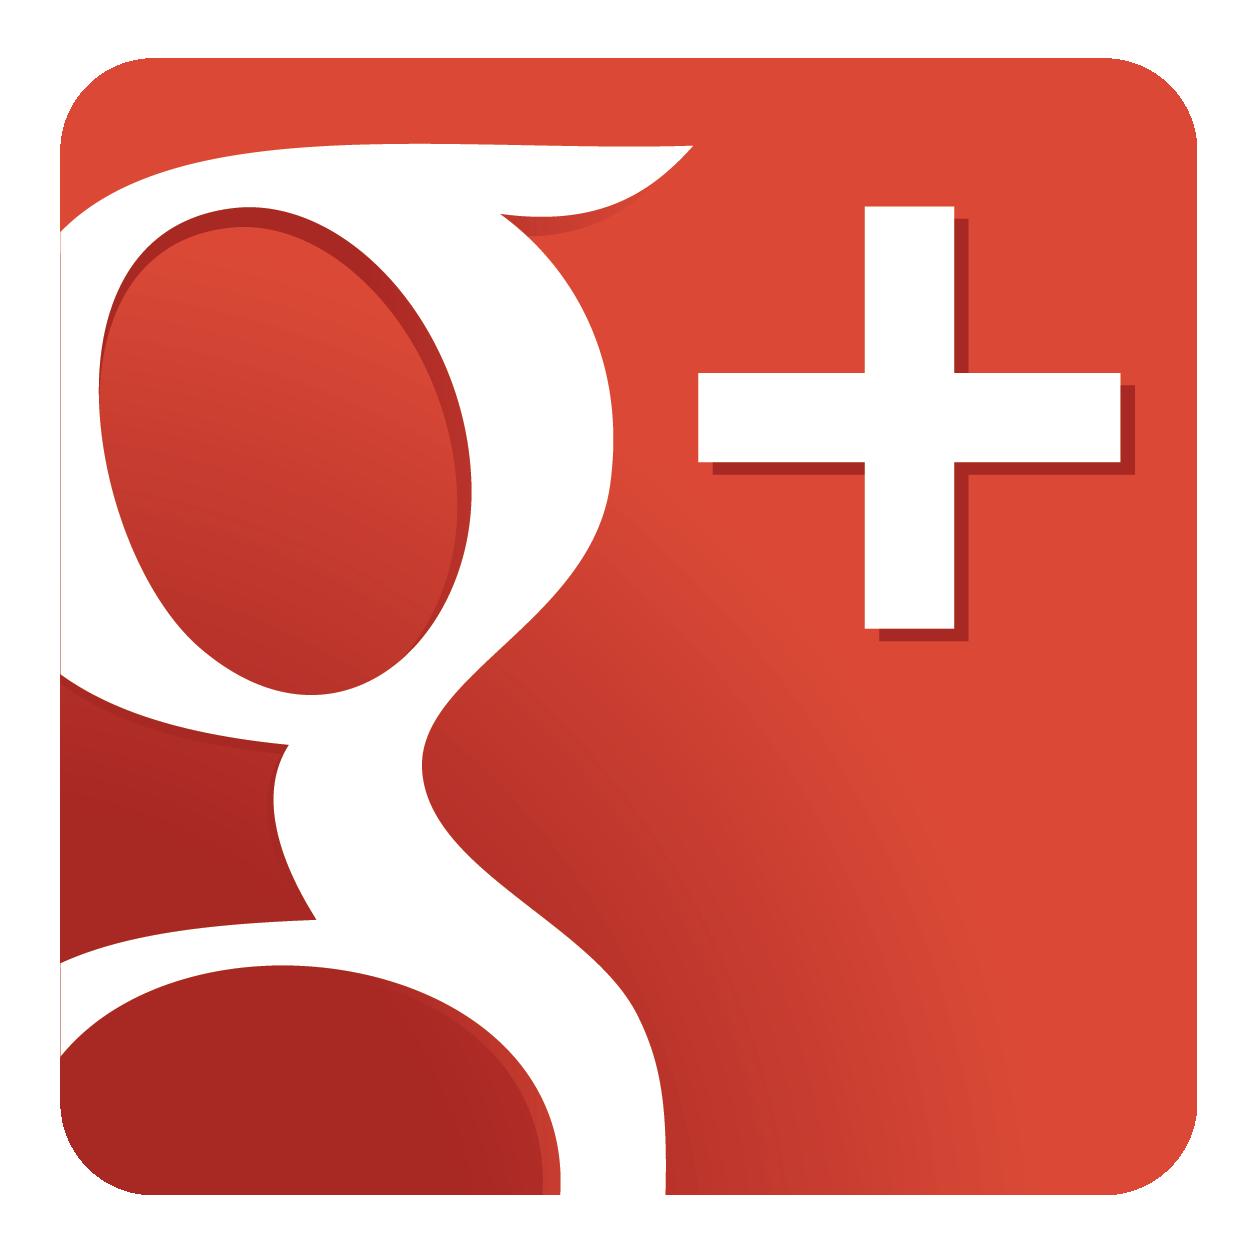 Visite a página de Paulo de Tarso no Google Play